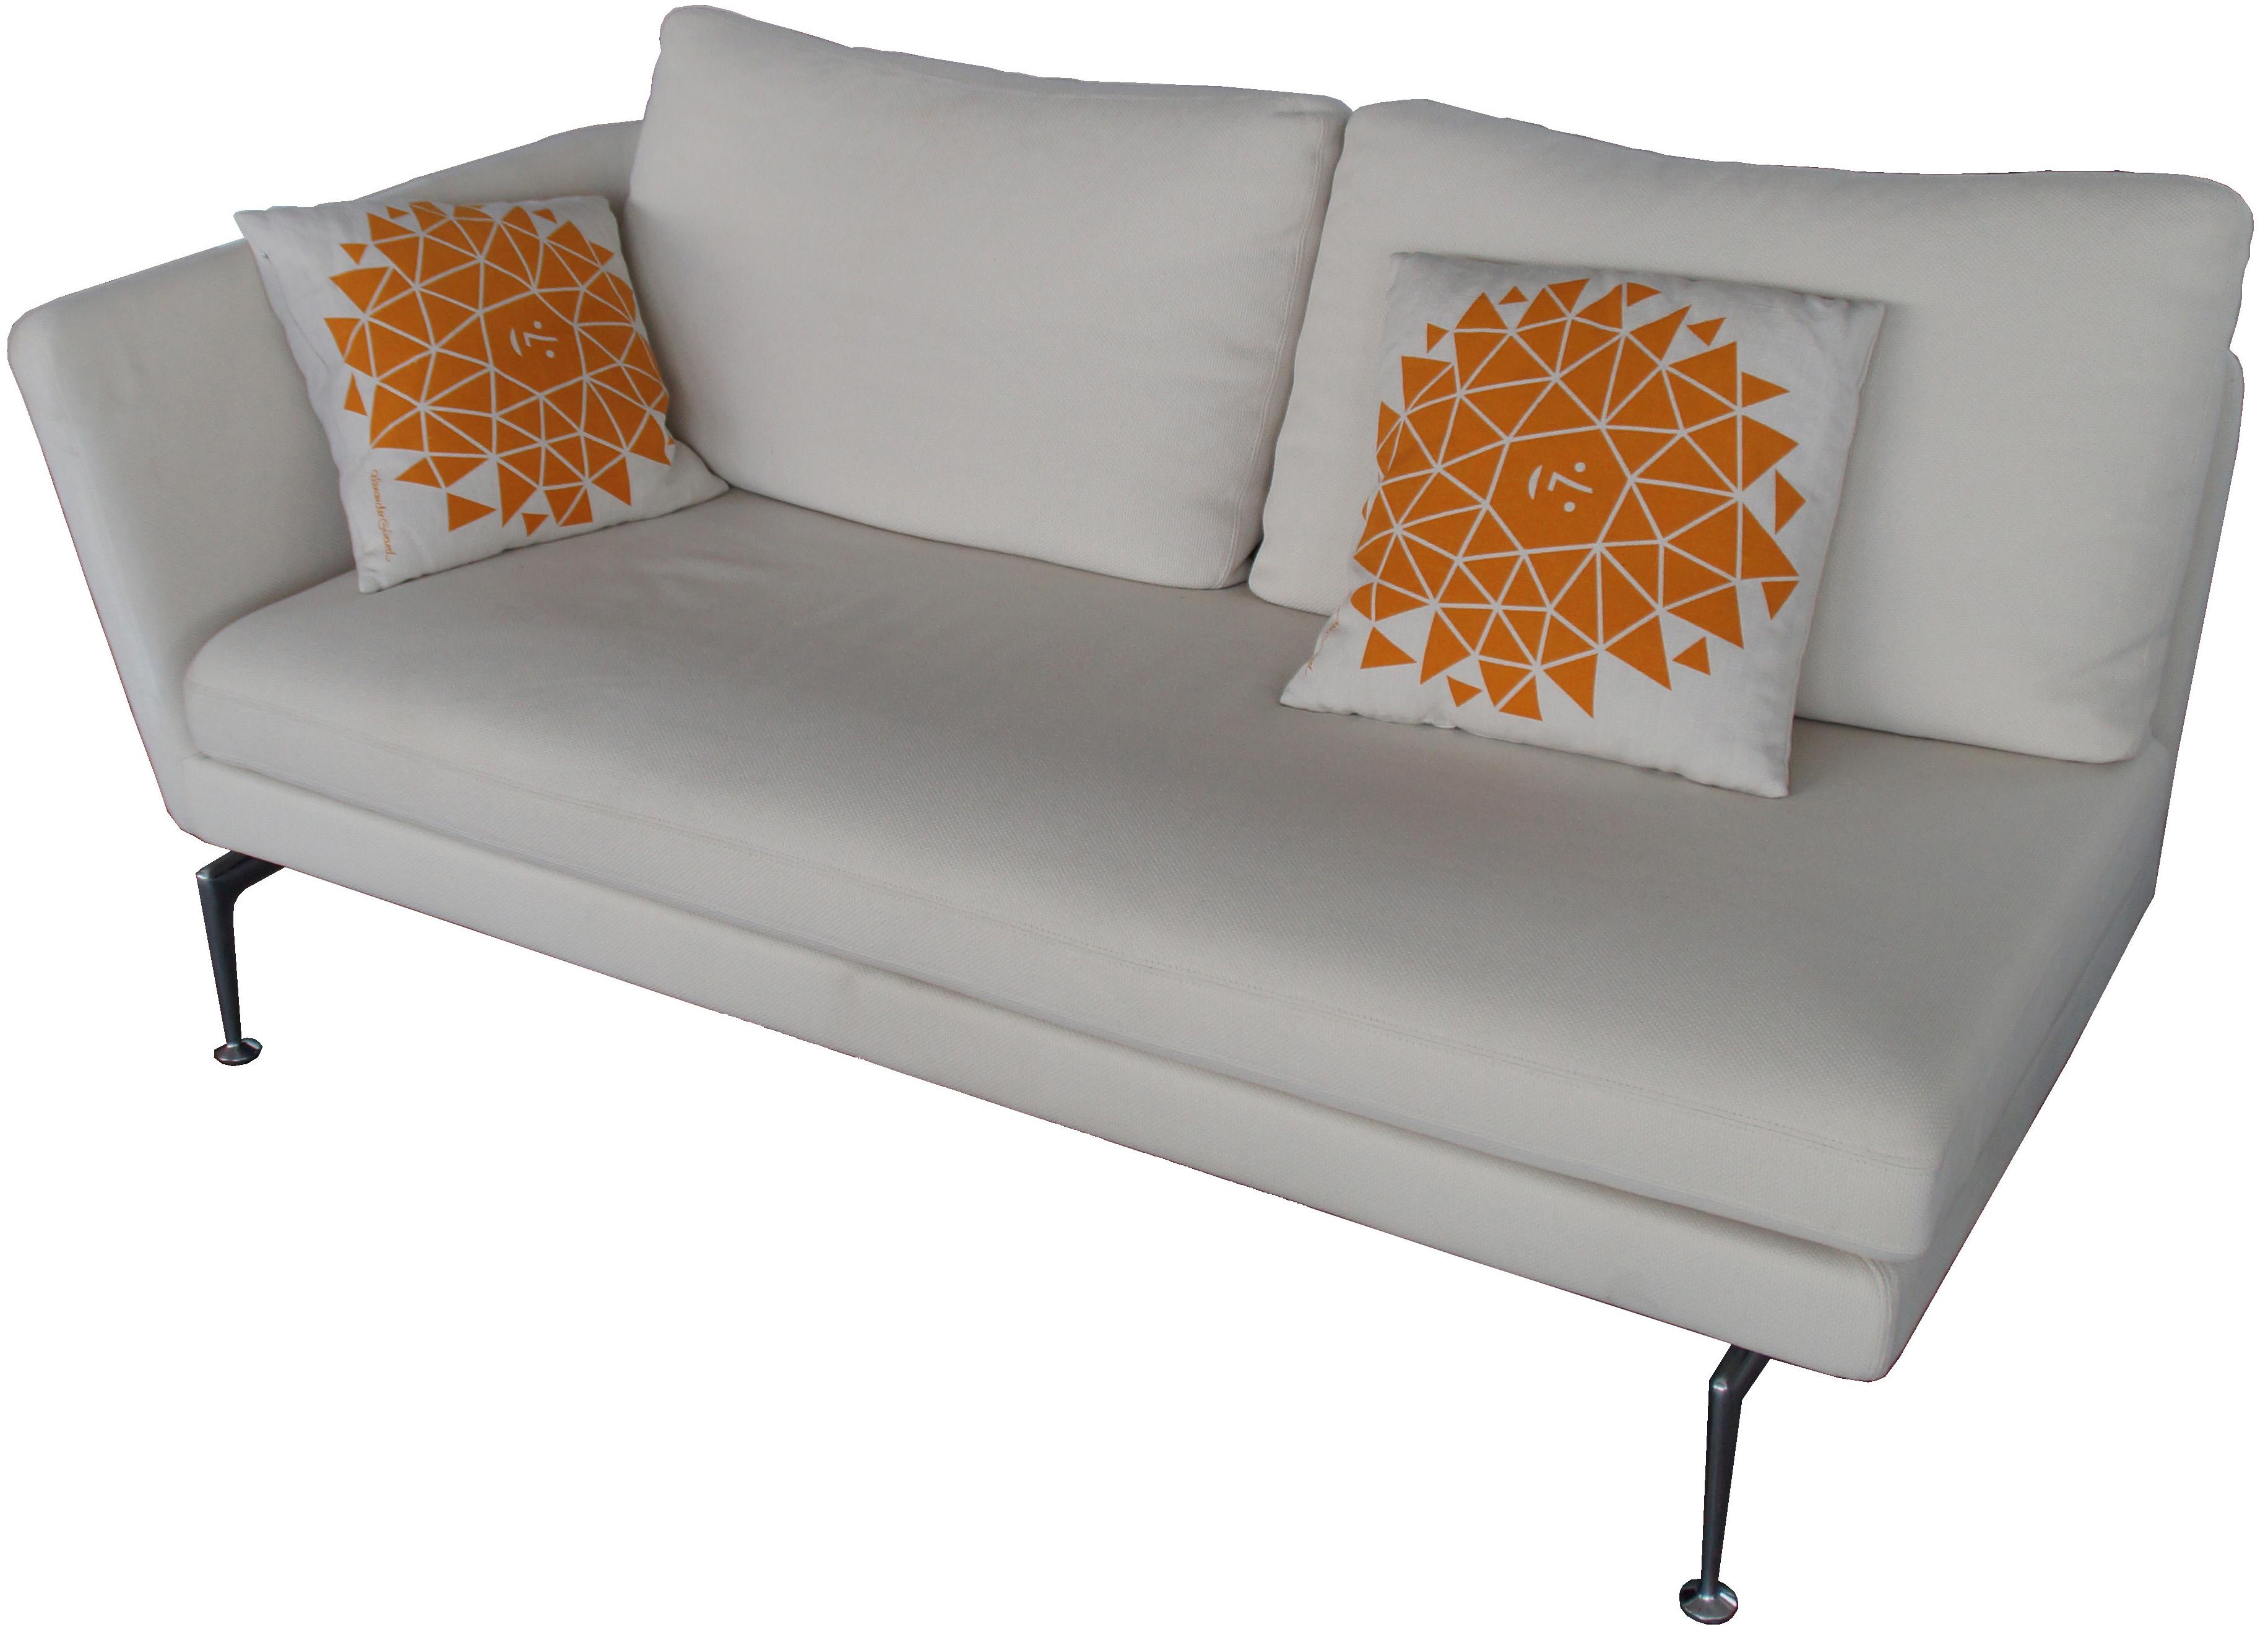 SUITA 2-Sitzer Sofa VITRA mit Armlehne links